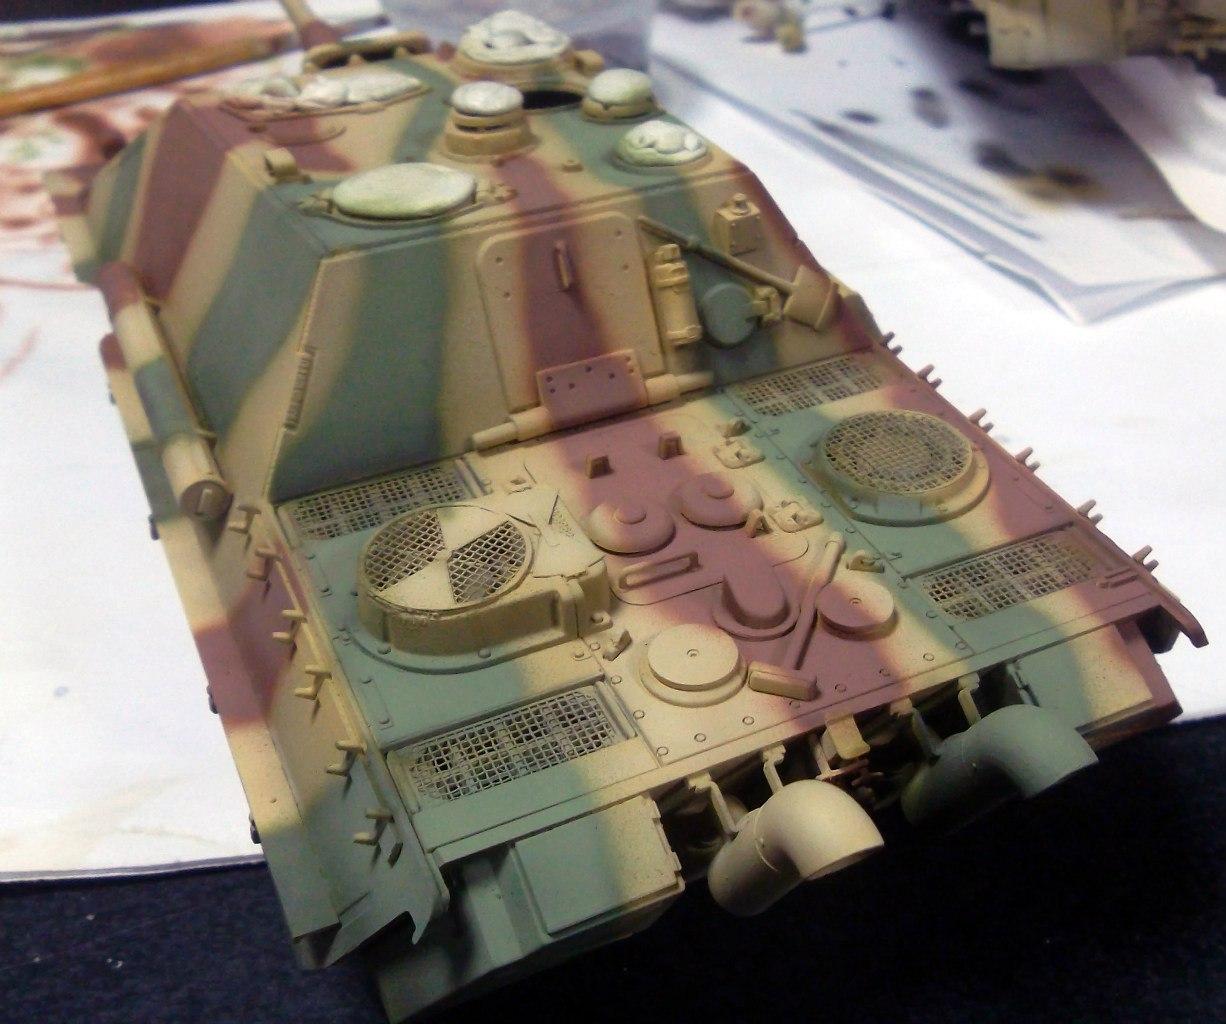 Jagdpanther (Late\поздний вариант) (Tamiya 35203 1/35) Bmglja3A8ik